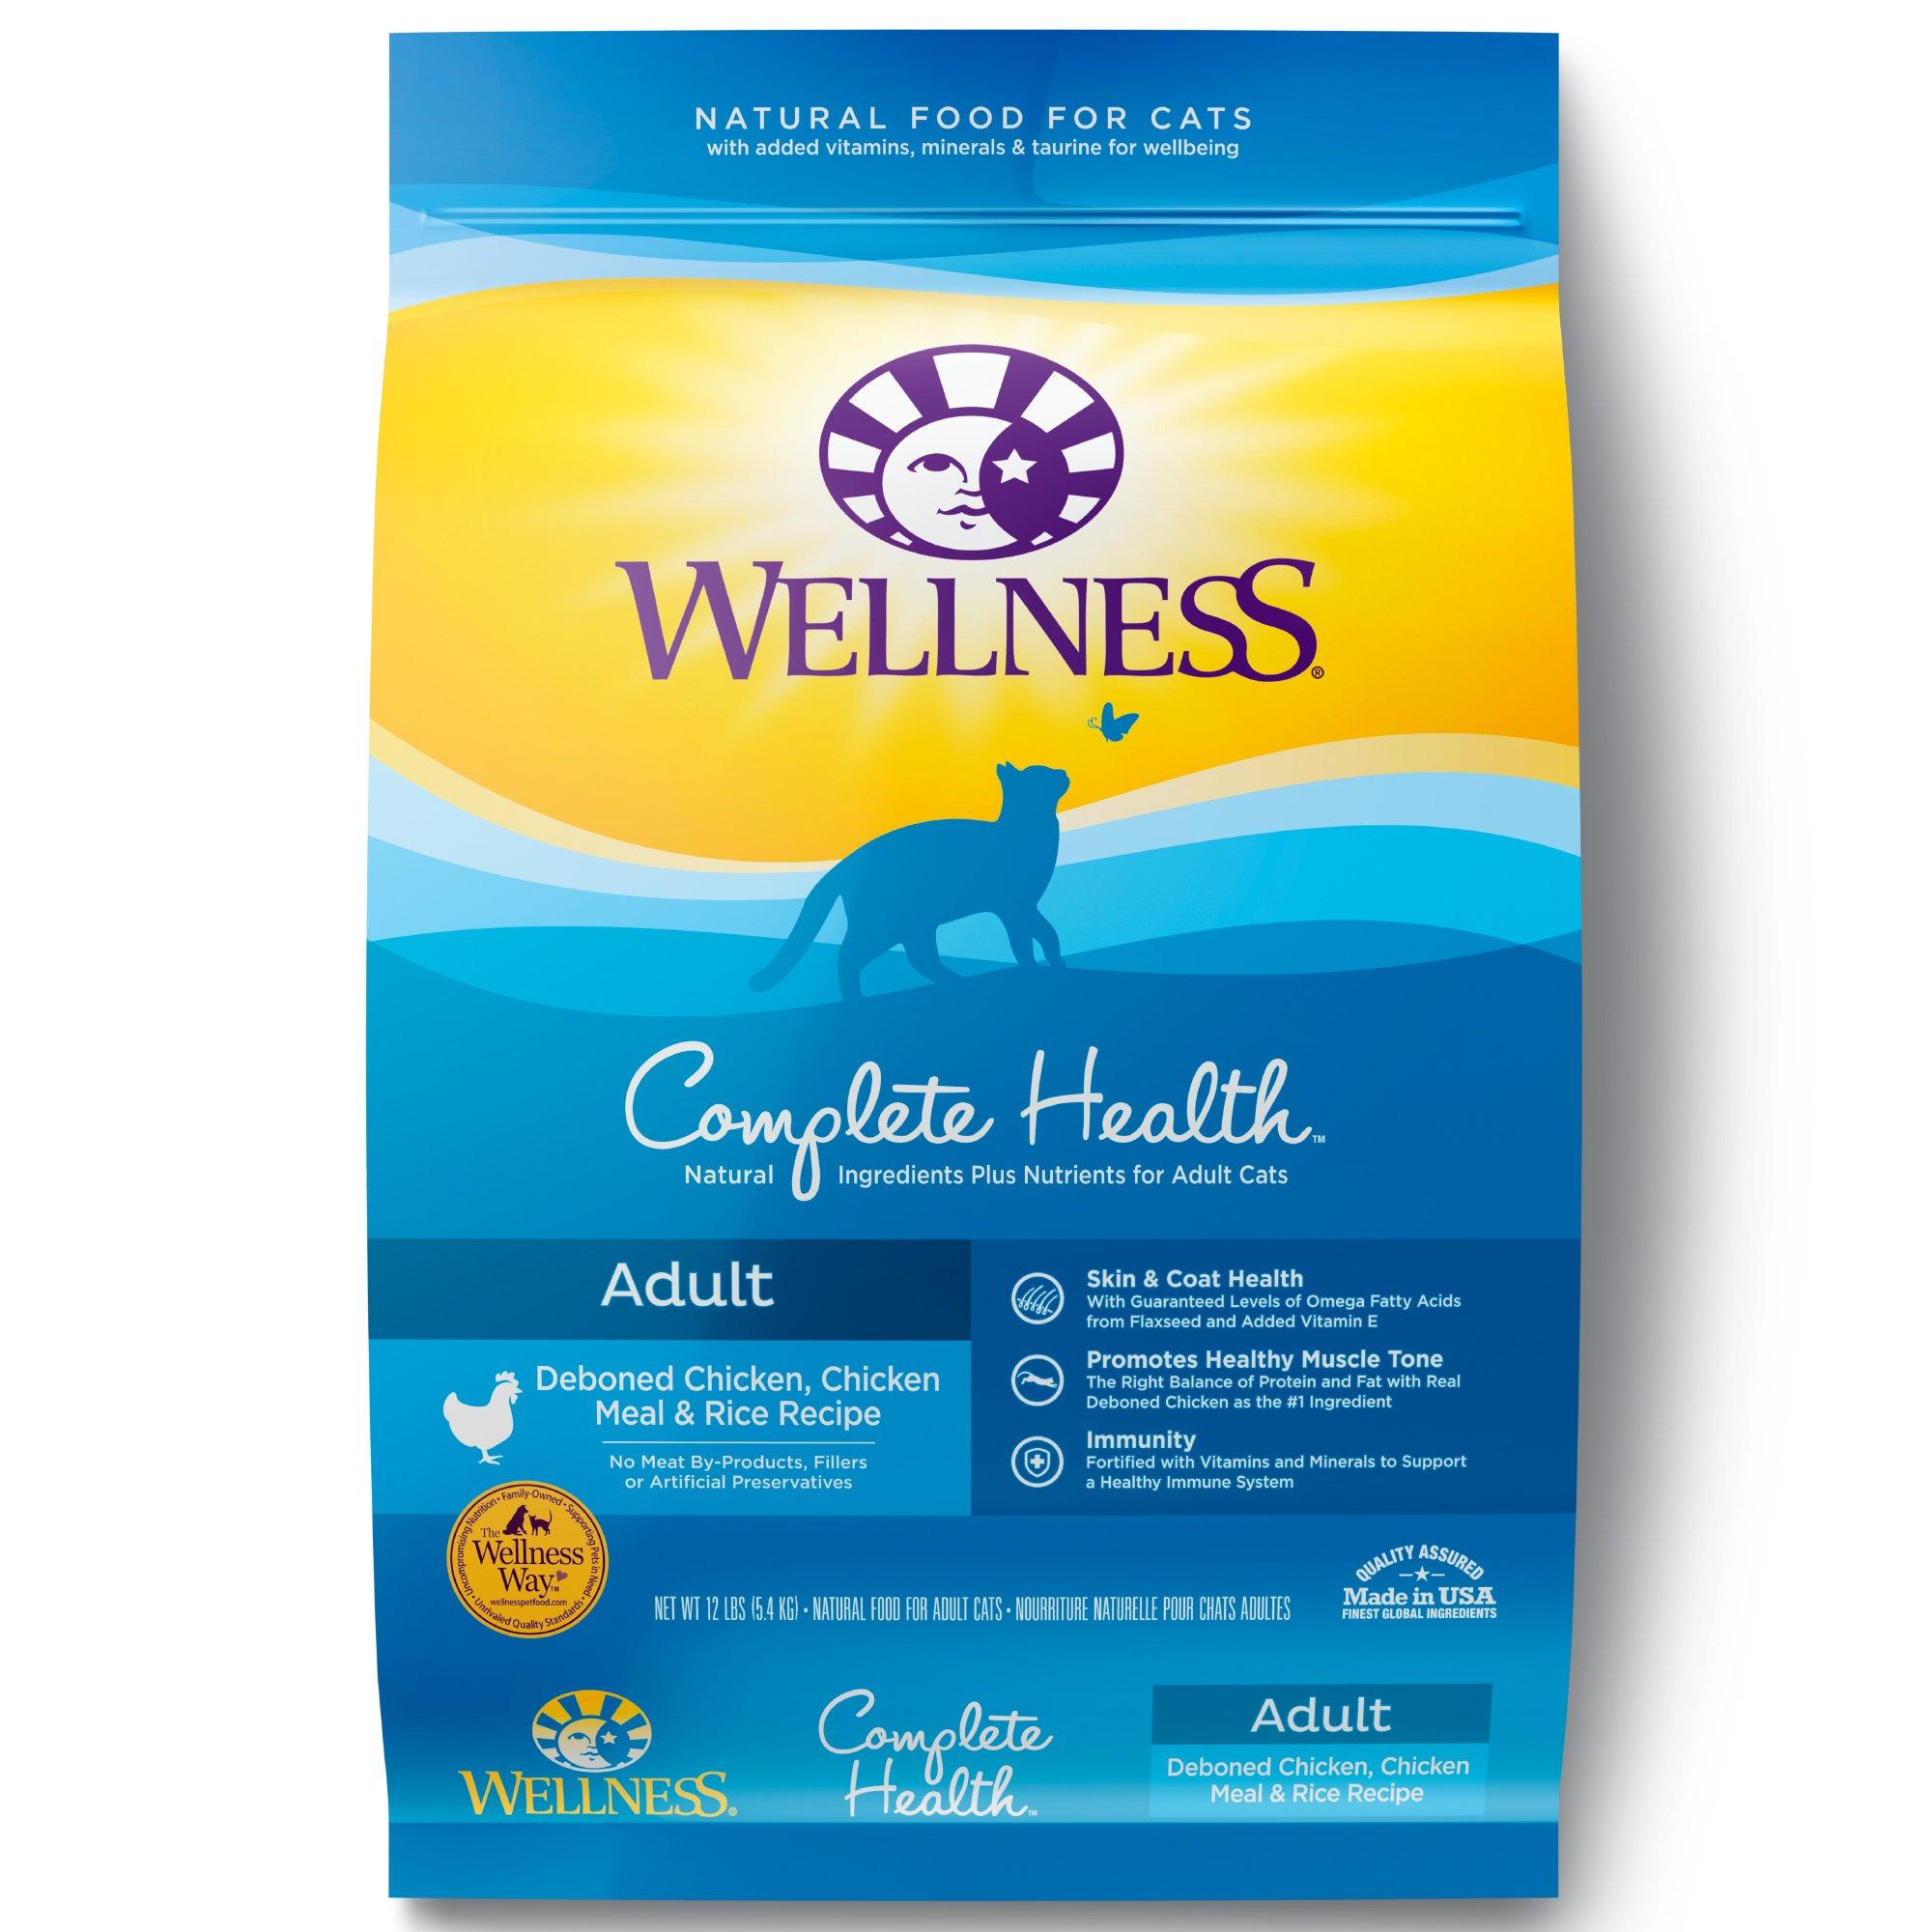 Wellness Complete Health Adult Deboned Chicken, Chicken Meal, & Rice Recipe Dry Cat Food, 12-lb bag